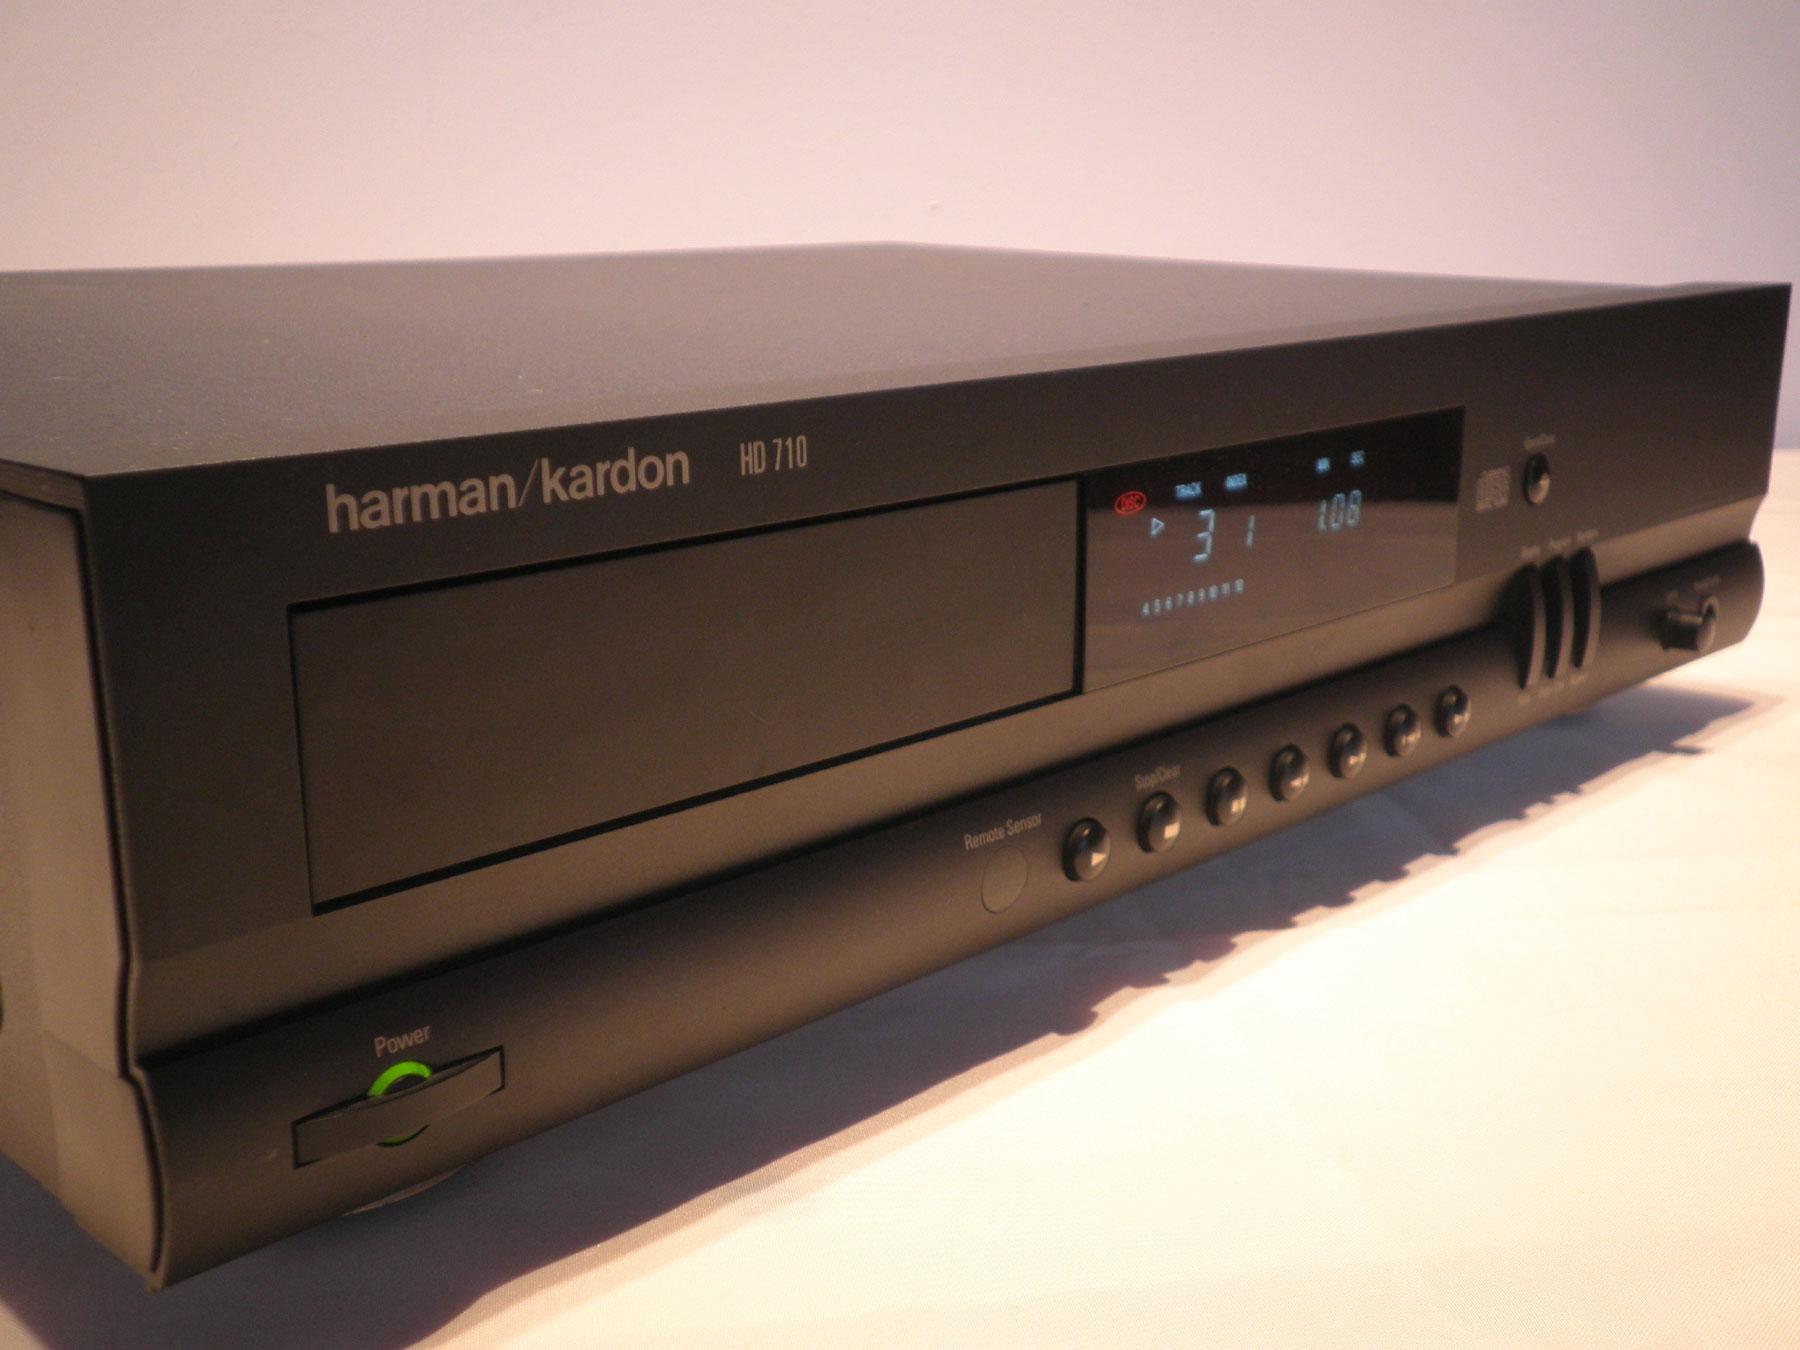 harman kardon cd player hd 710 ebay. Black Bedroom Furniture Sets. Home Design Ideas